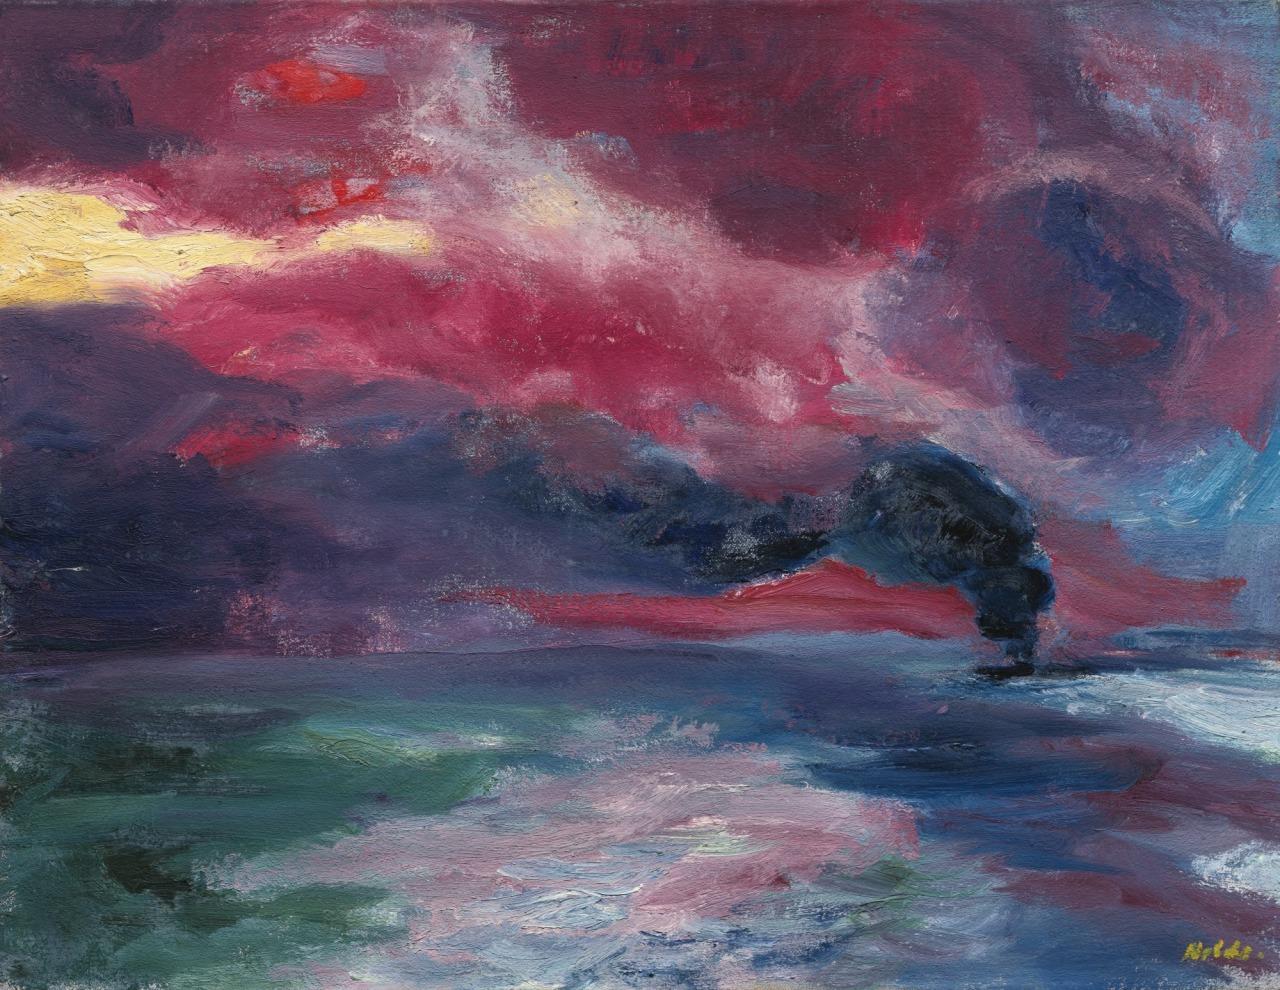 peira:  Emil Nolde: Abendliches Herbstmeer (1951)